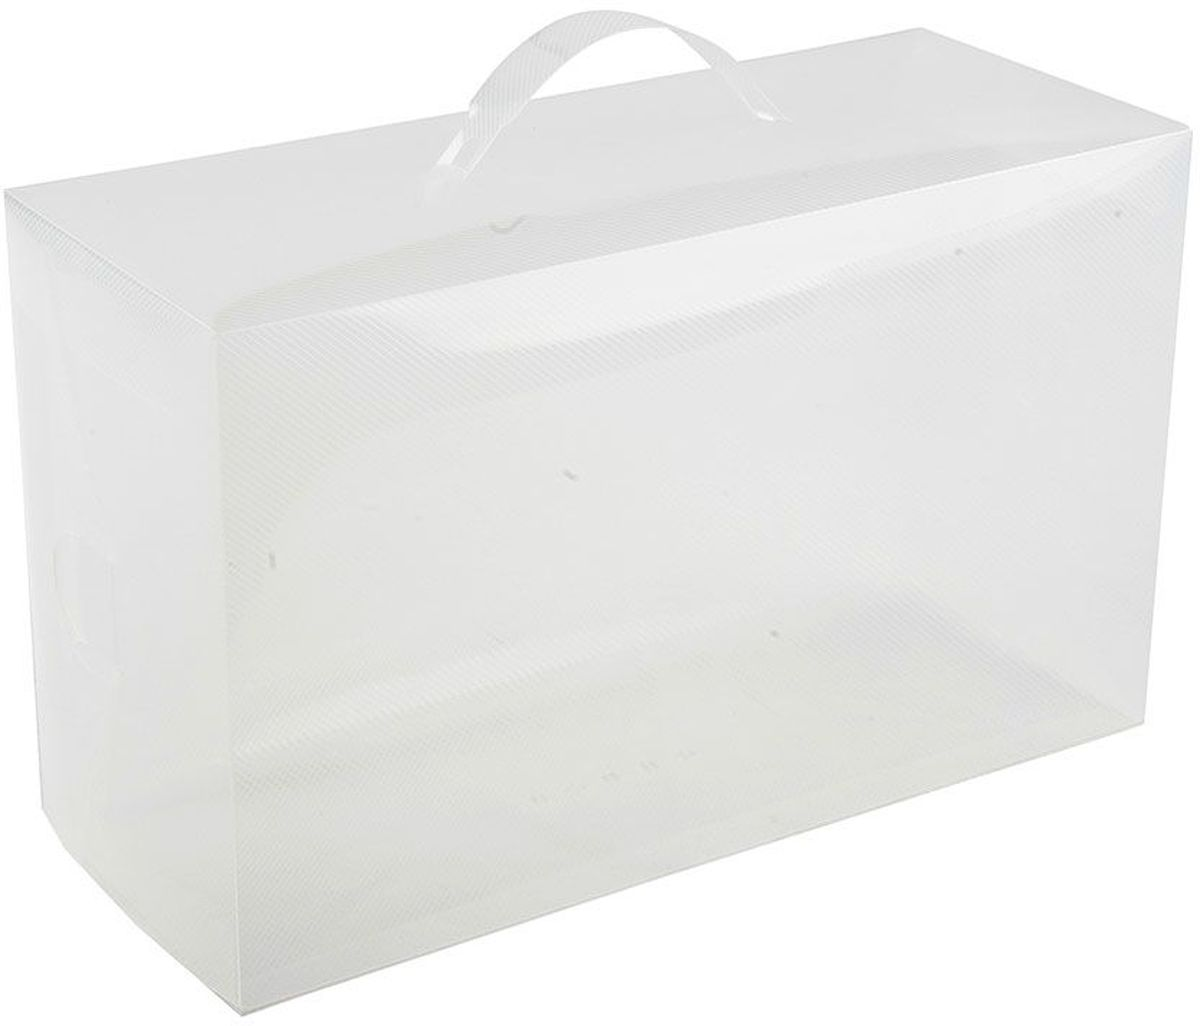 Набор коробов для хранения обуви Handy Home, 35 х 21 х 14 см, 2 шт набор коробов для хранения ecowoo boy and girl 2 шт